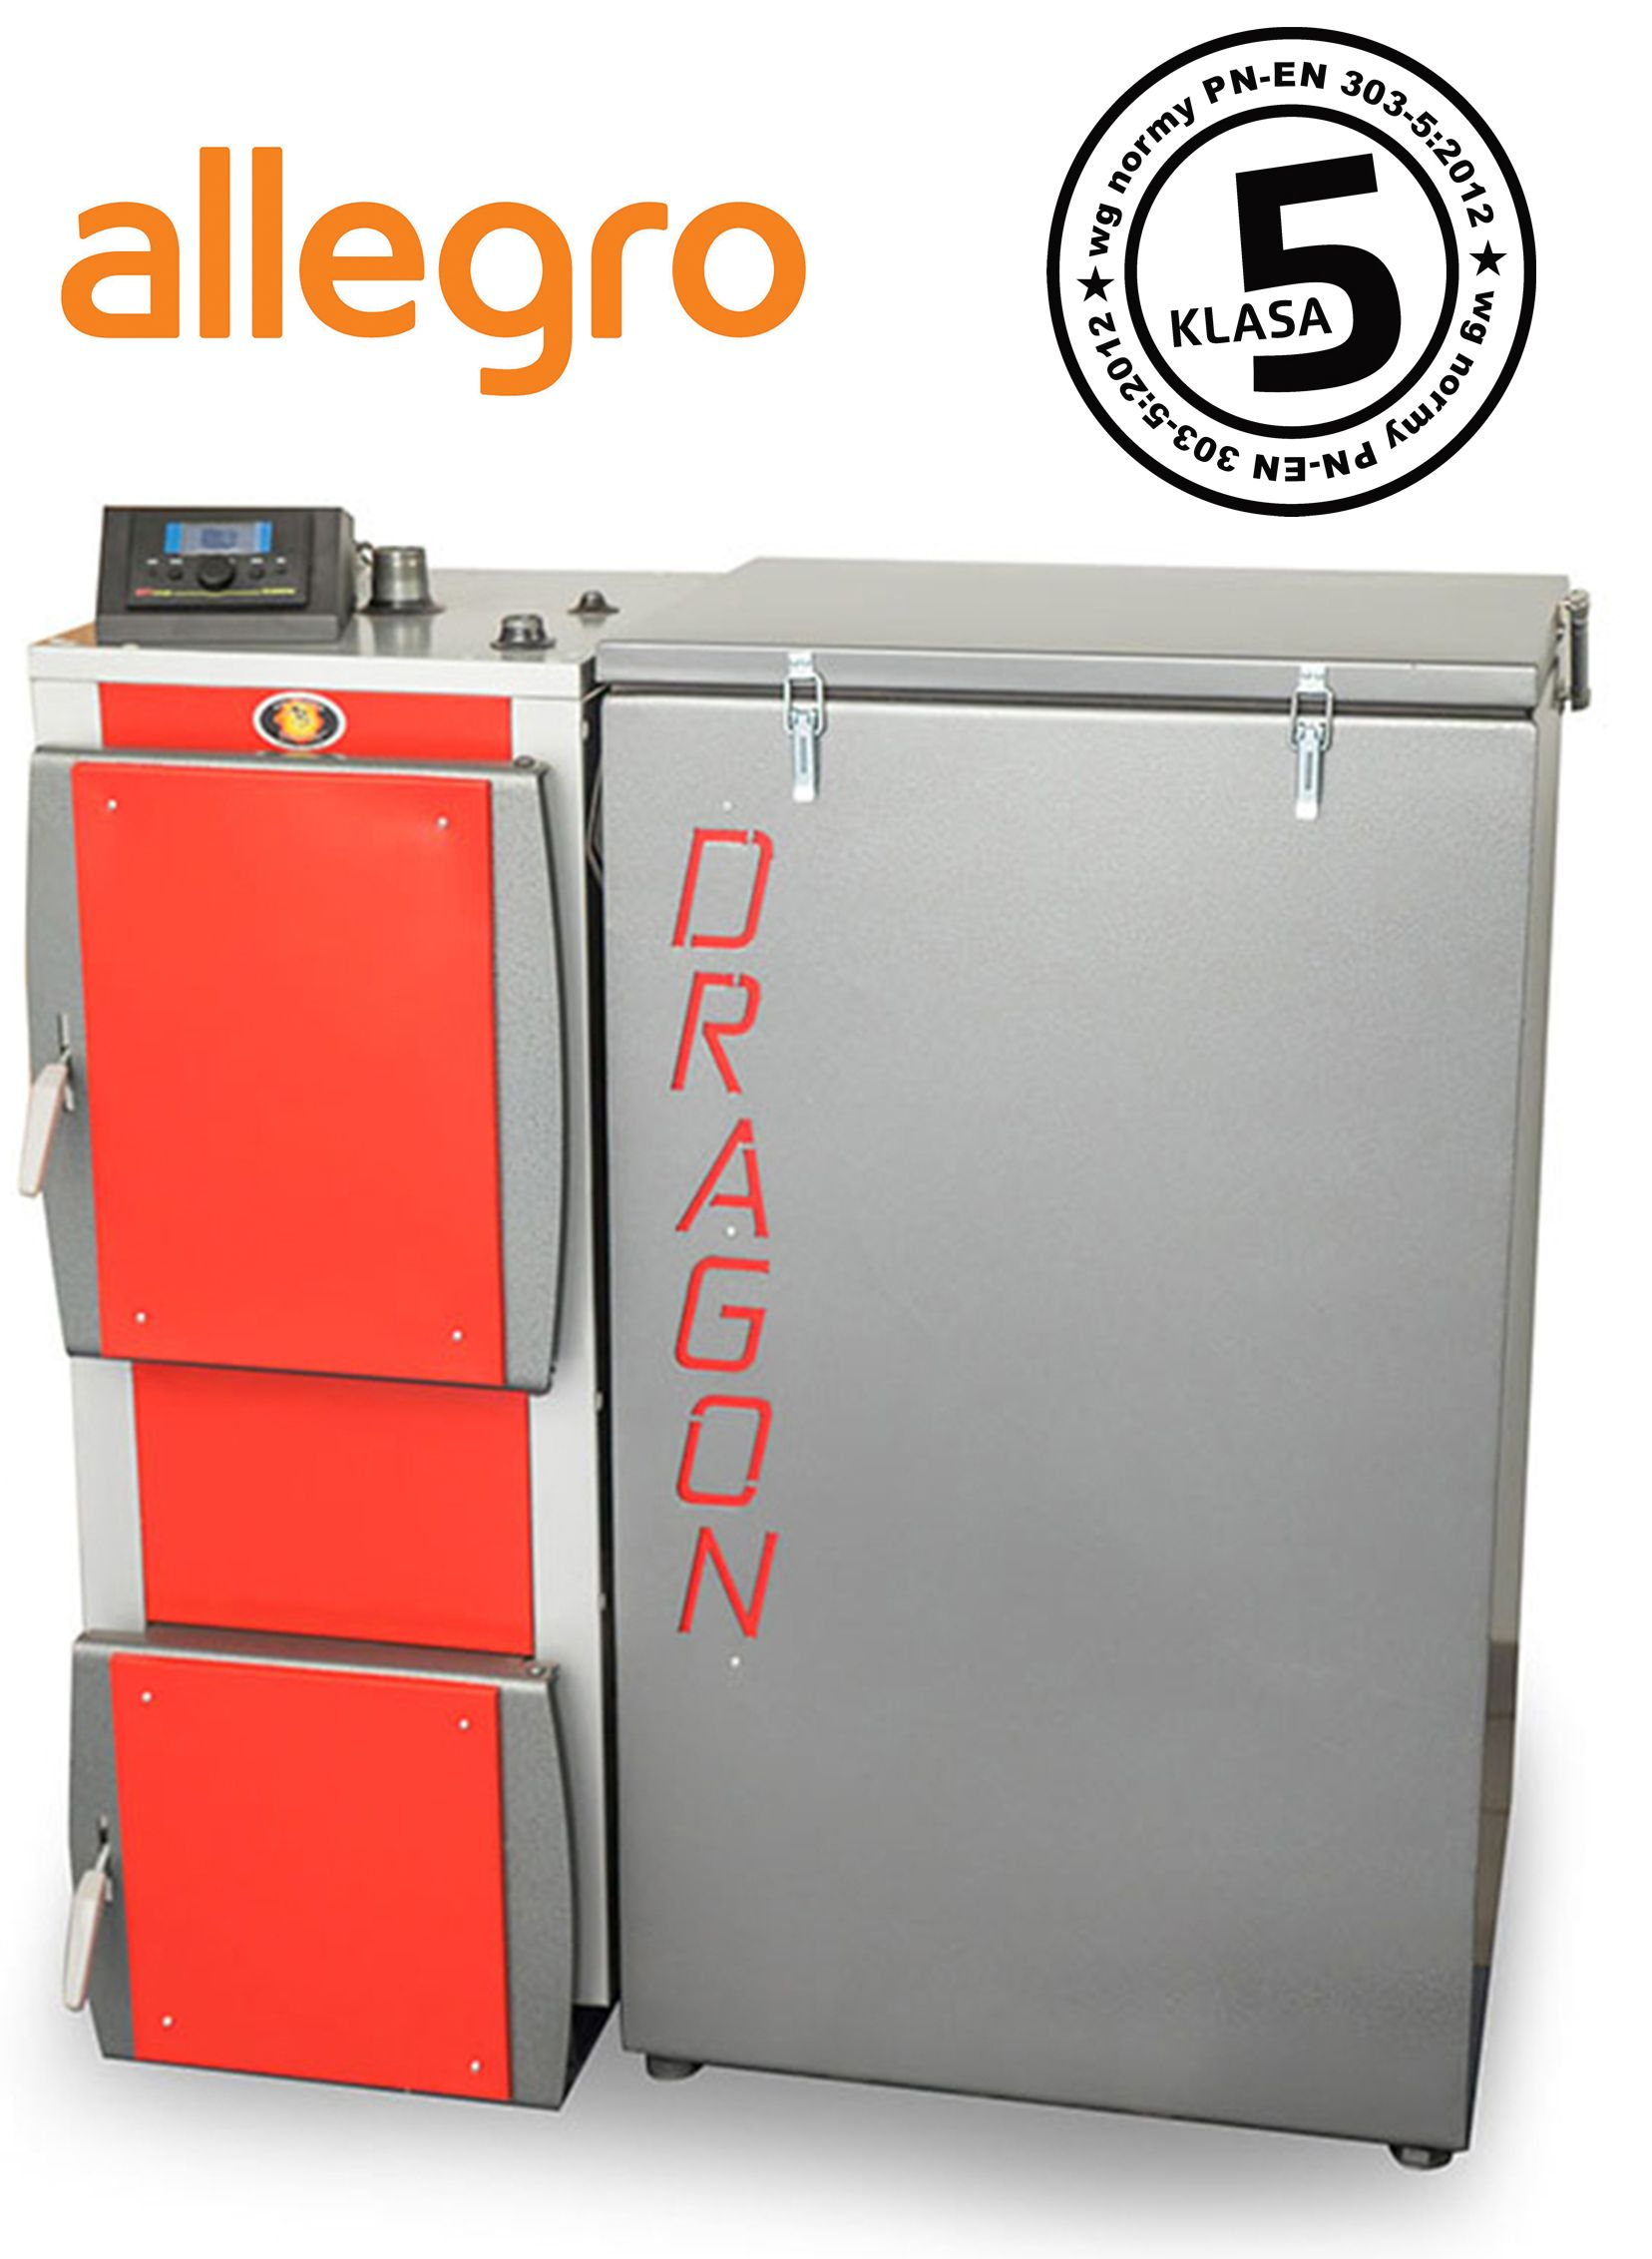 Kociol Piec Na Pellety 5 Klasa Moc 21kw Ecodesign Locker Storage Lockers Storage